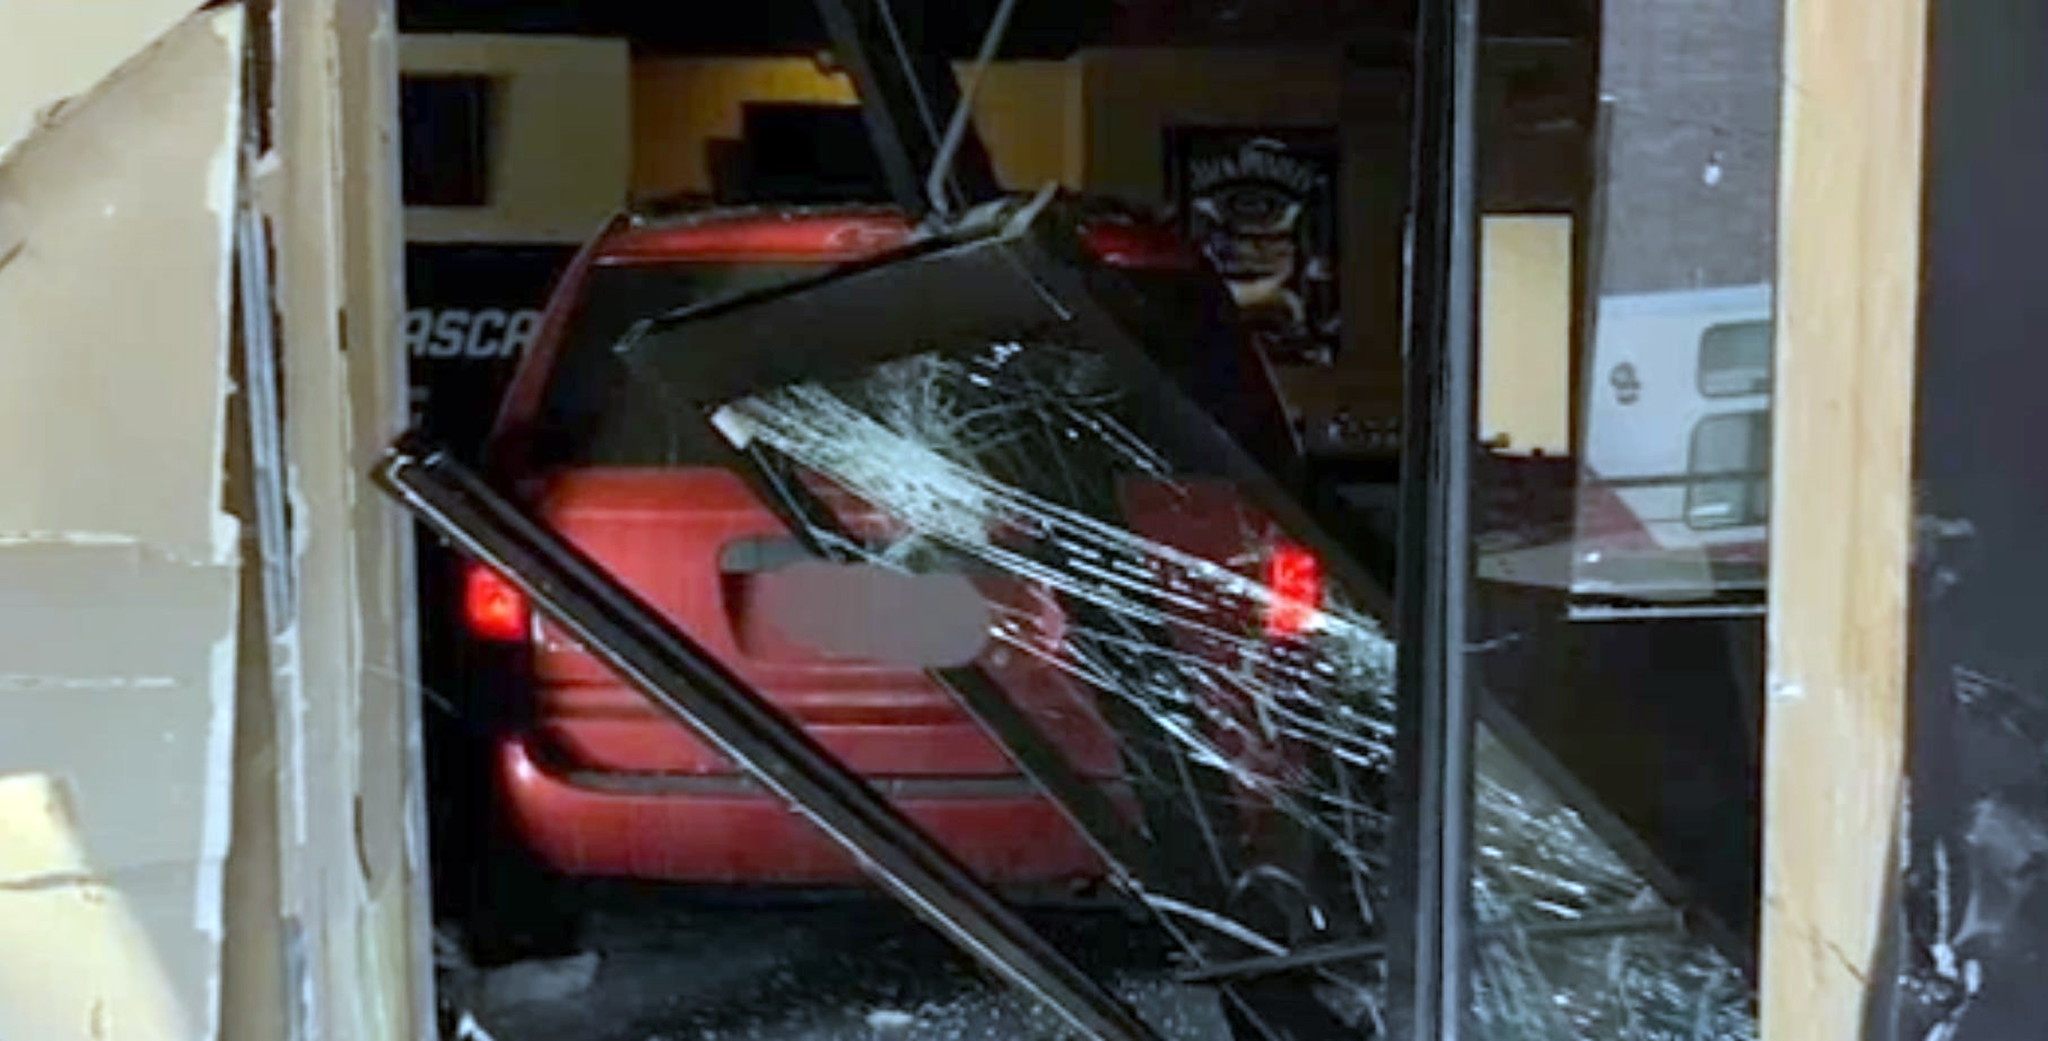 SEE IT: Colorado thieves crash stolen minivan into restaurant before robbery